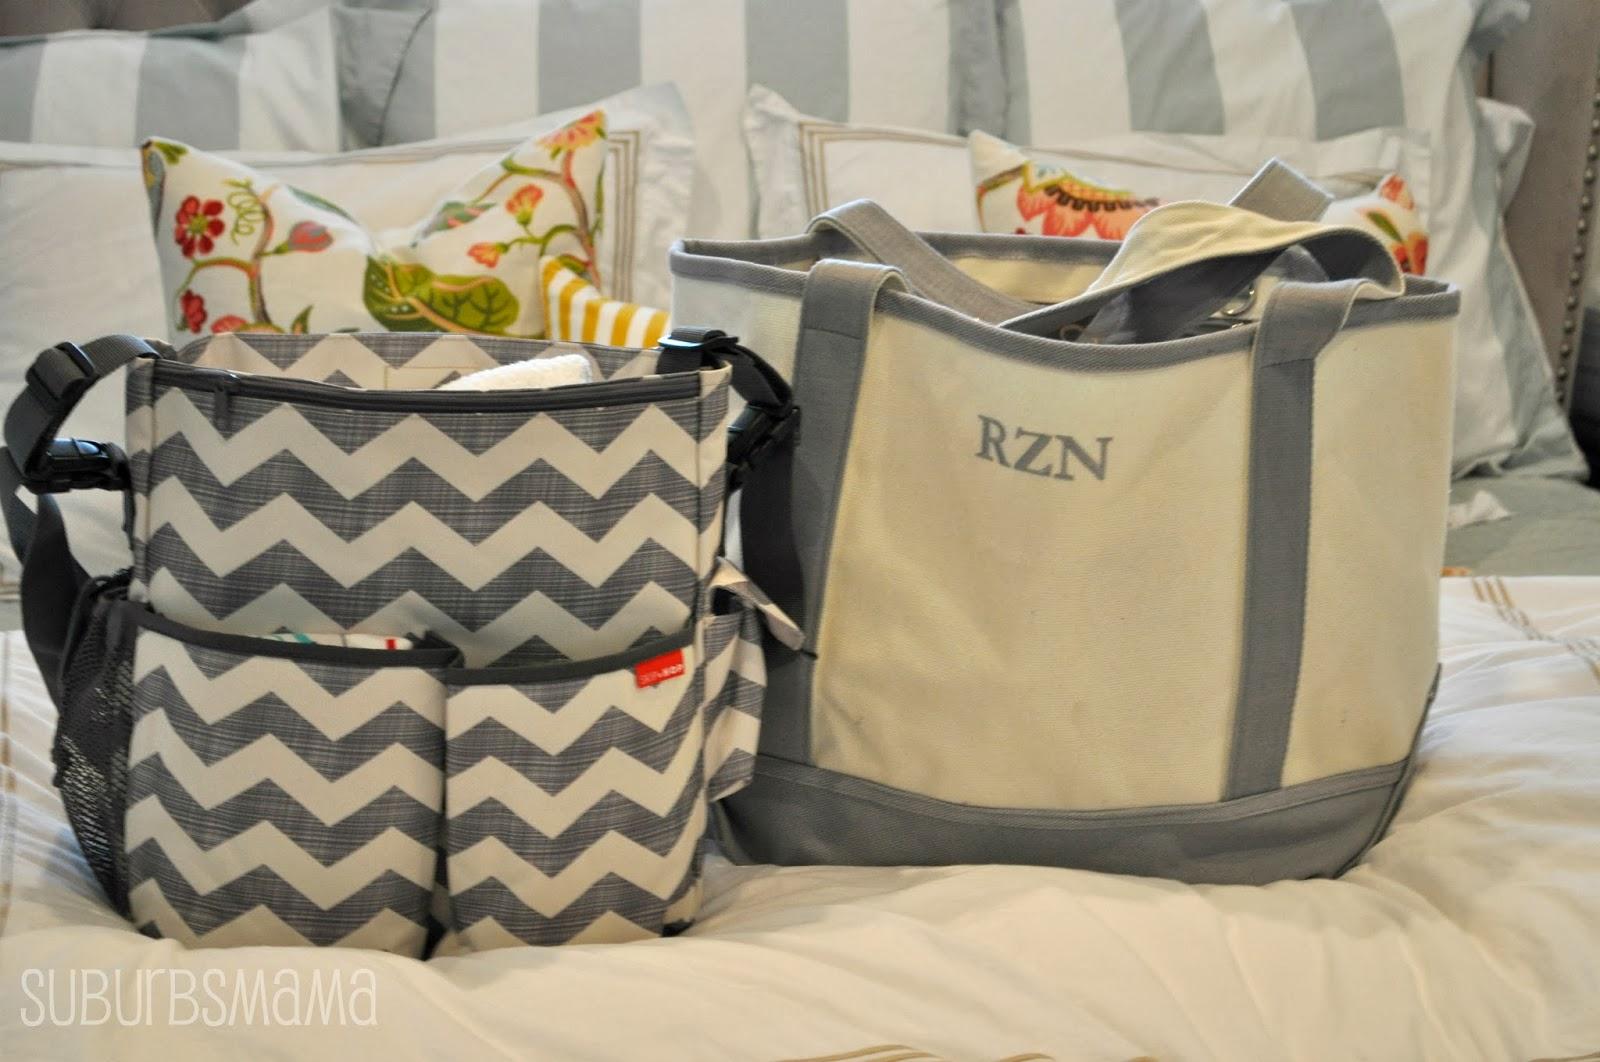 Suburbs Mama: Packing the Hospital Bag